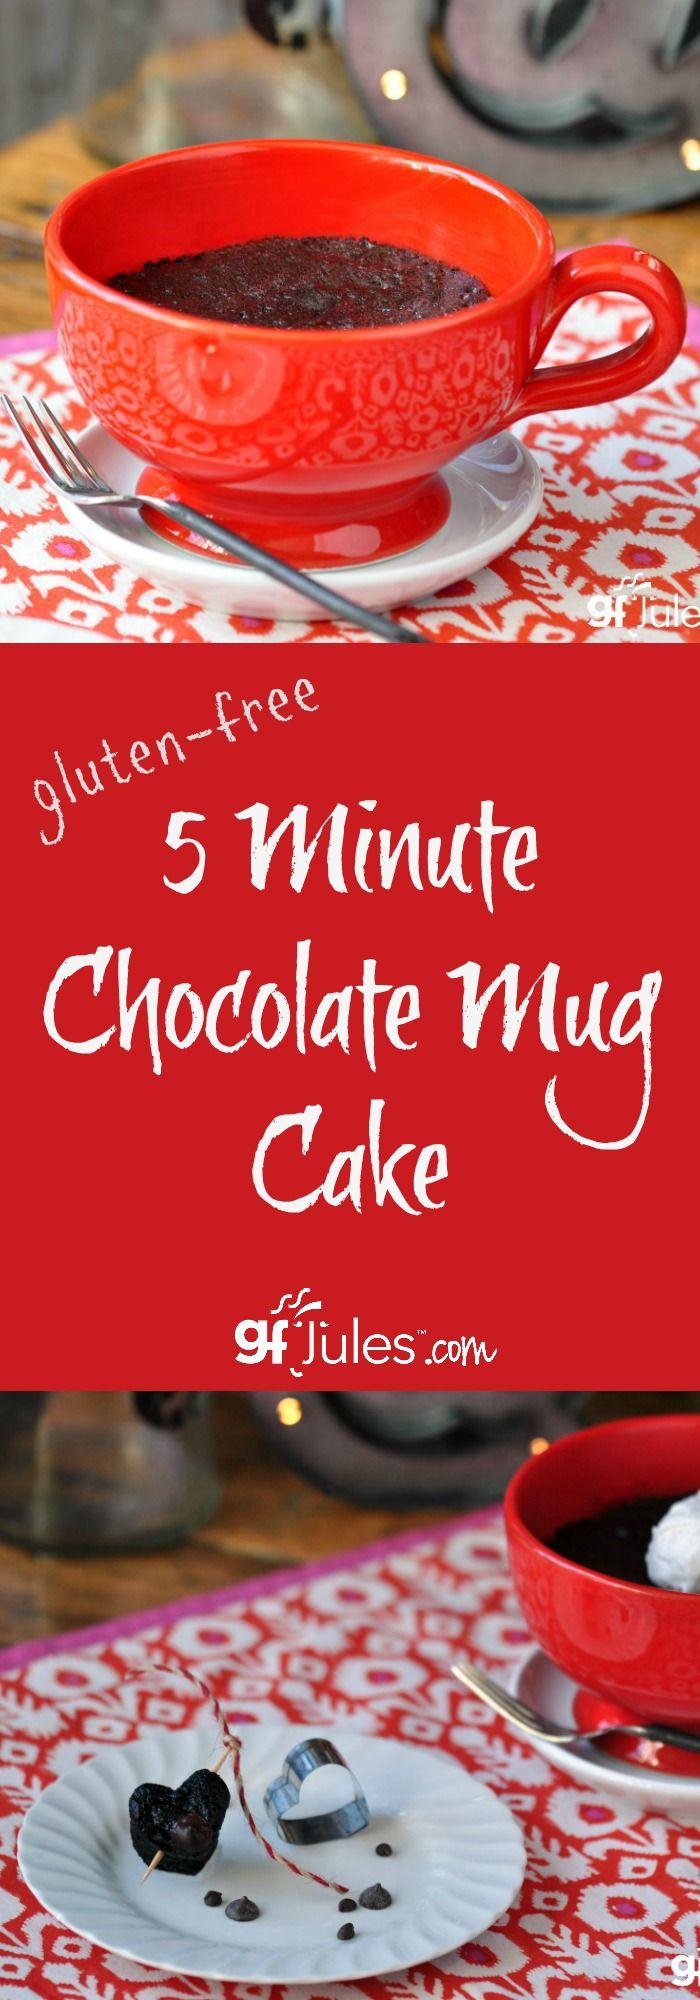 5 Minute Gluten Free Chocolate Mug Cake | Recipe | Gluten ...